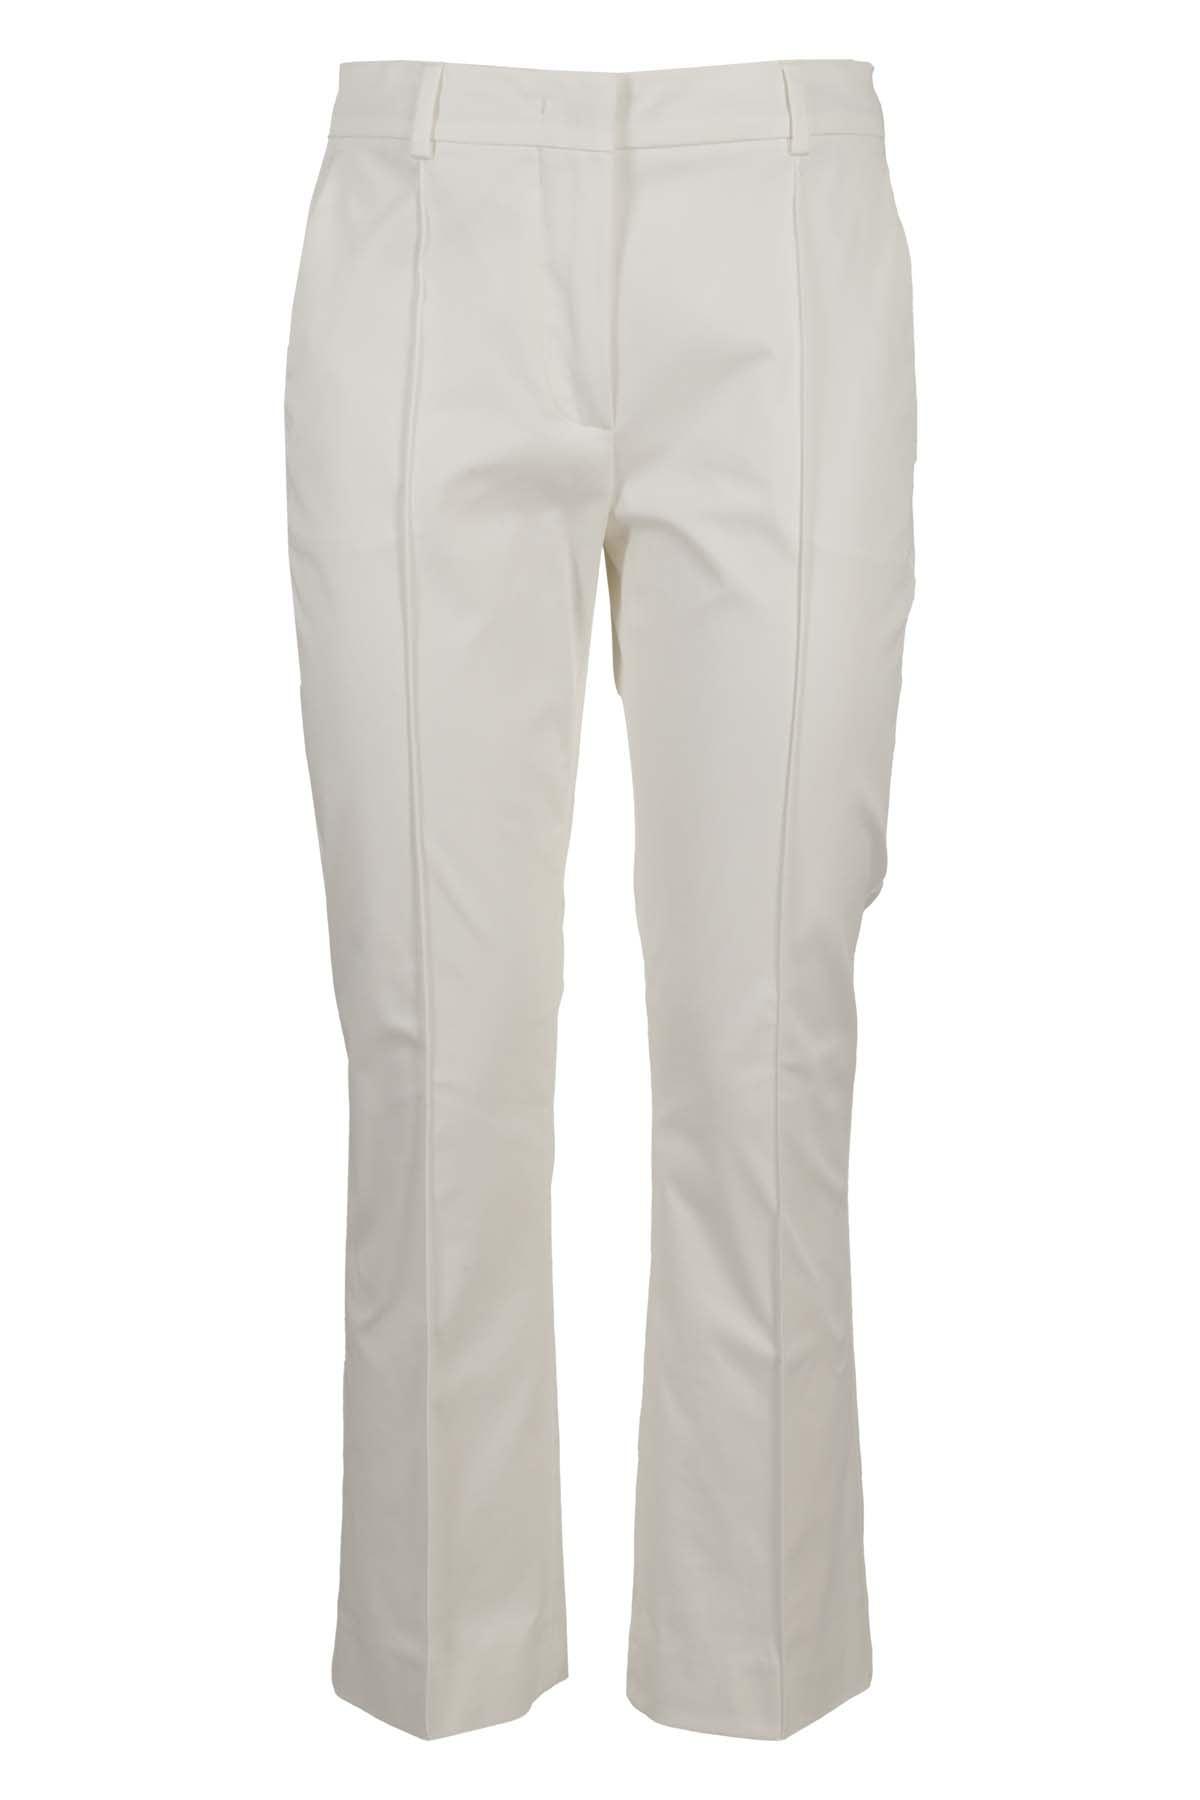 Sportmax Pants PANTS